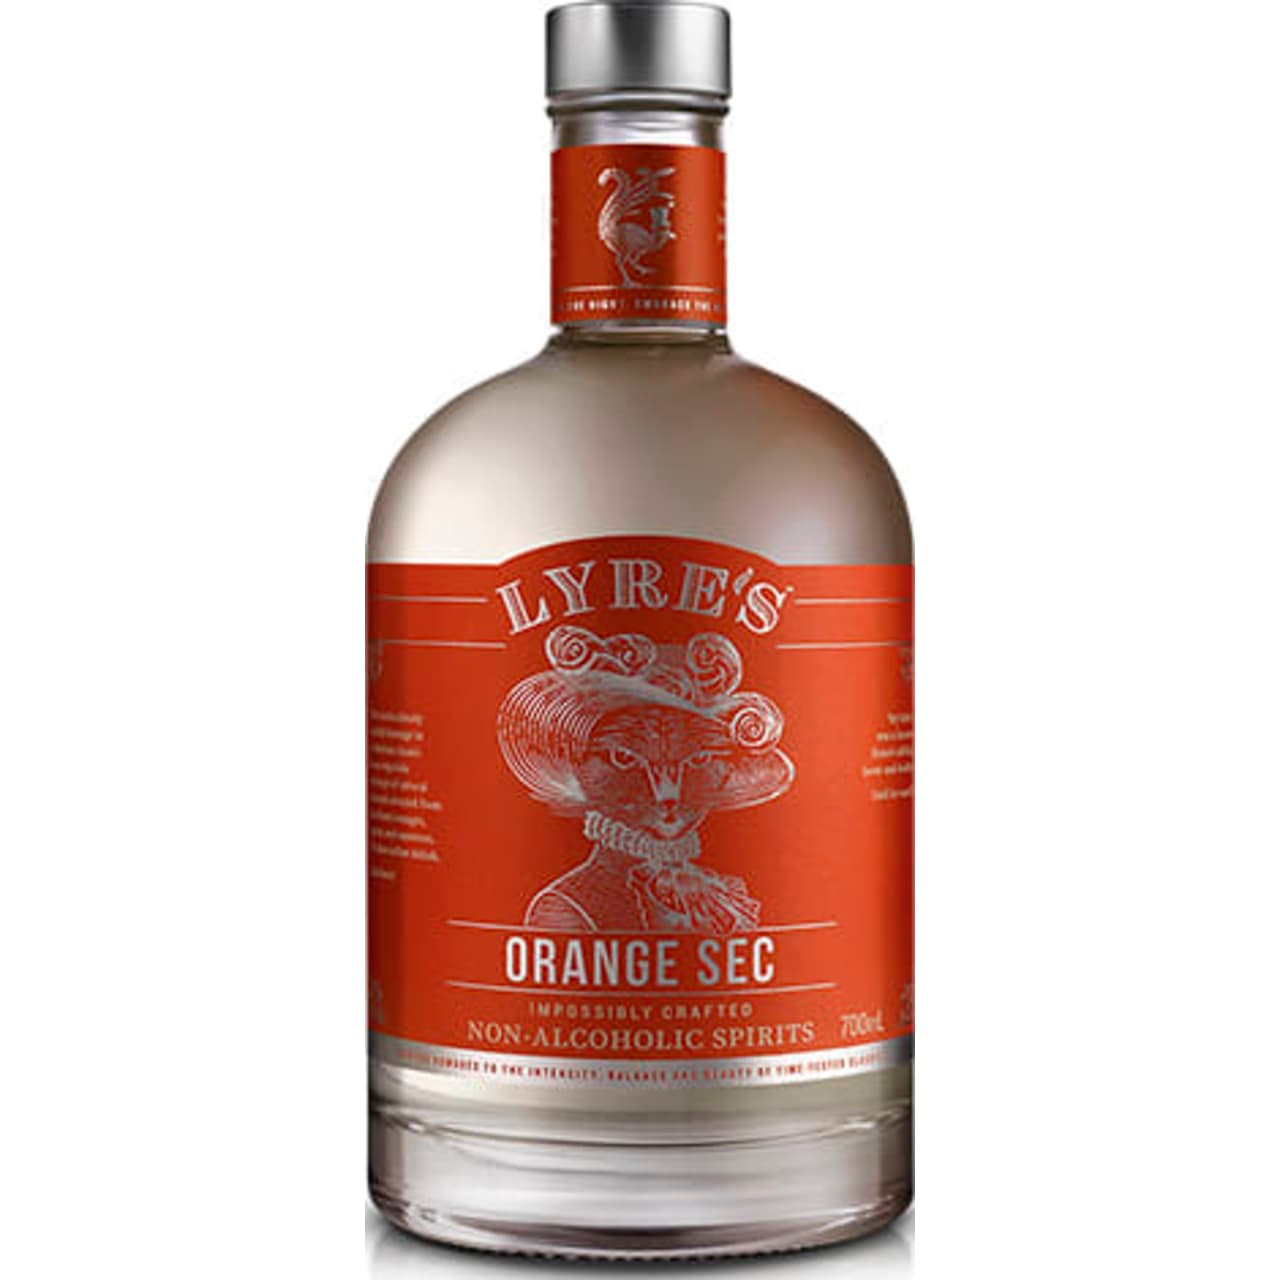 Product Image - Lyres Non Alcoholic Orange Sec